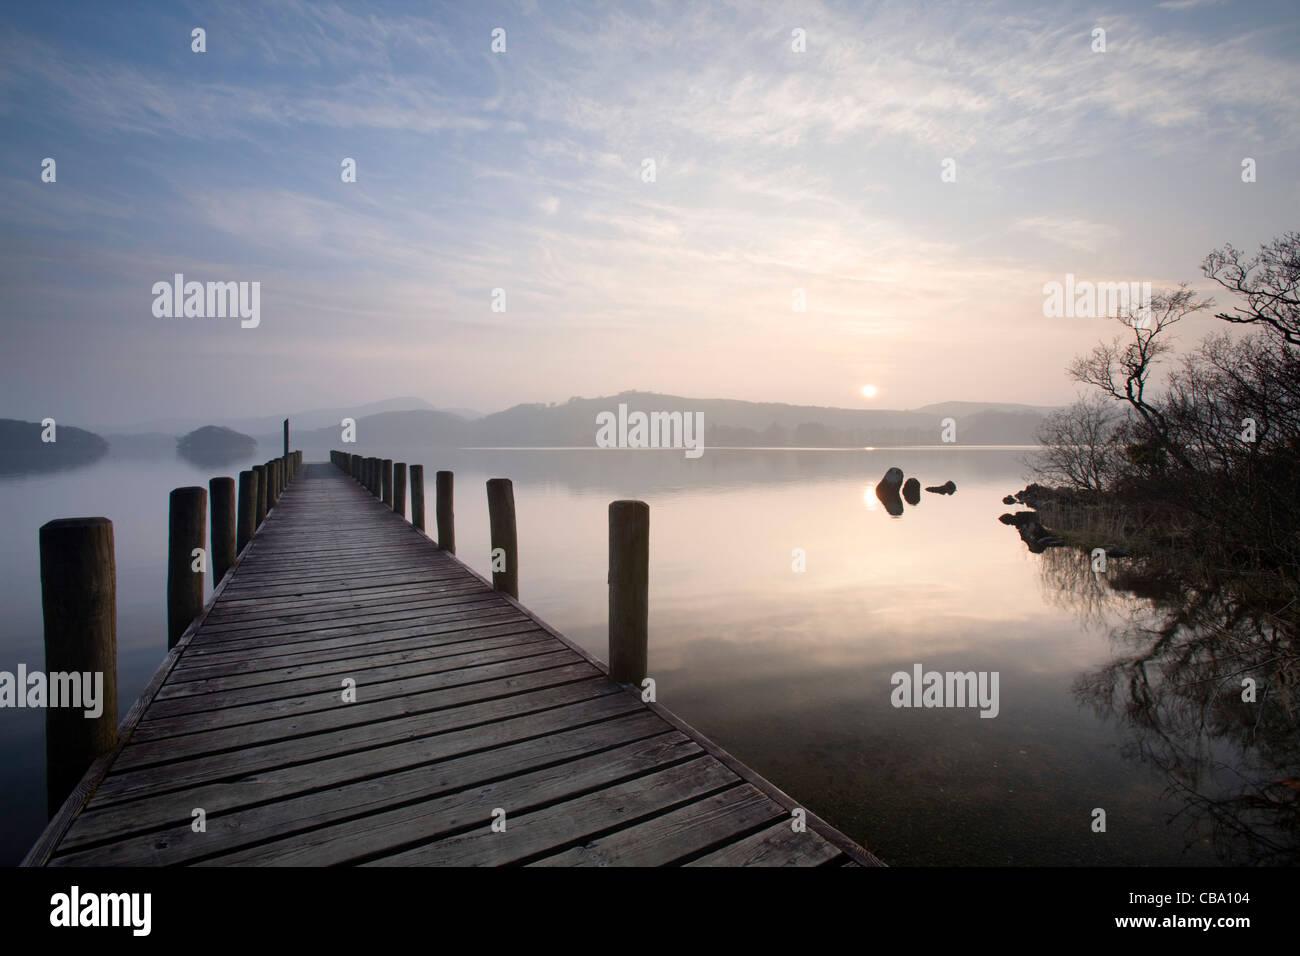 Jetty into still lake Lake district - Stock Image